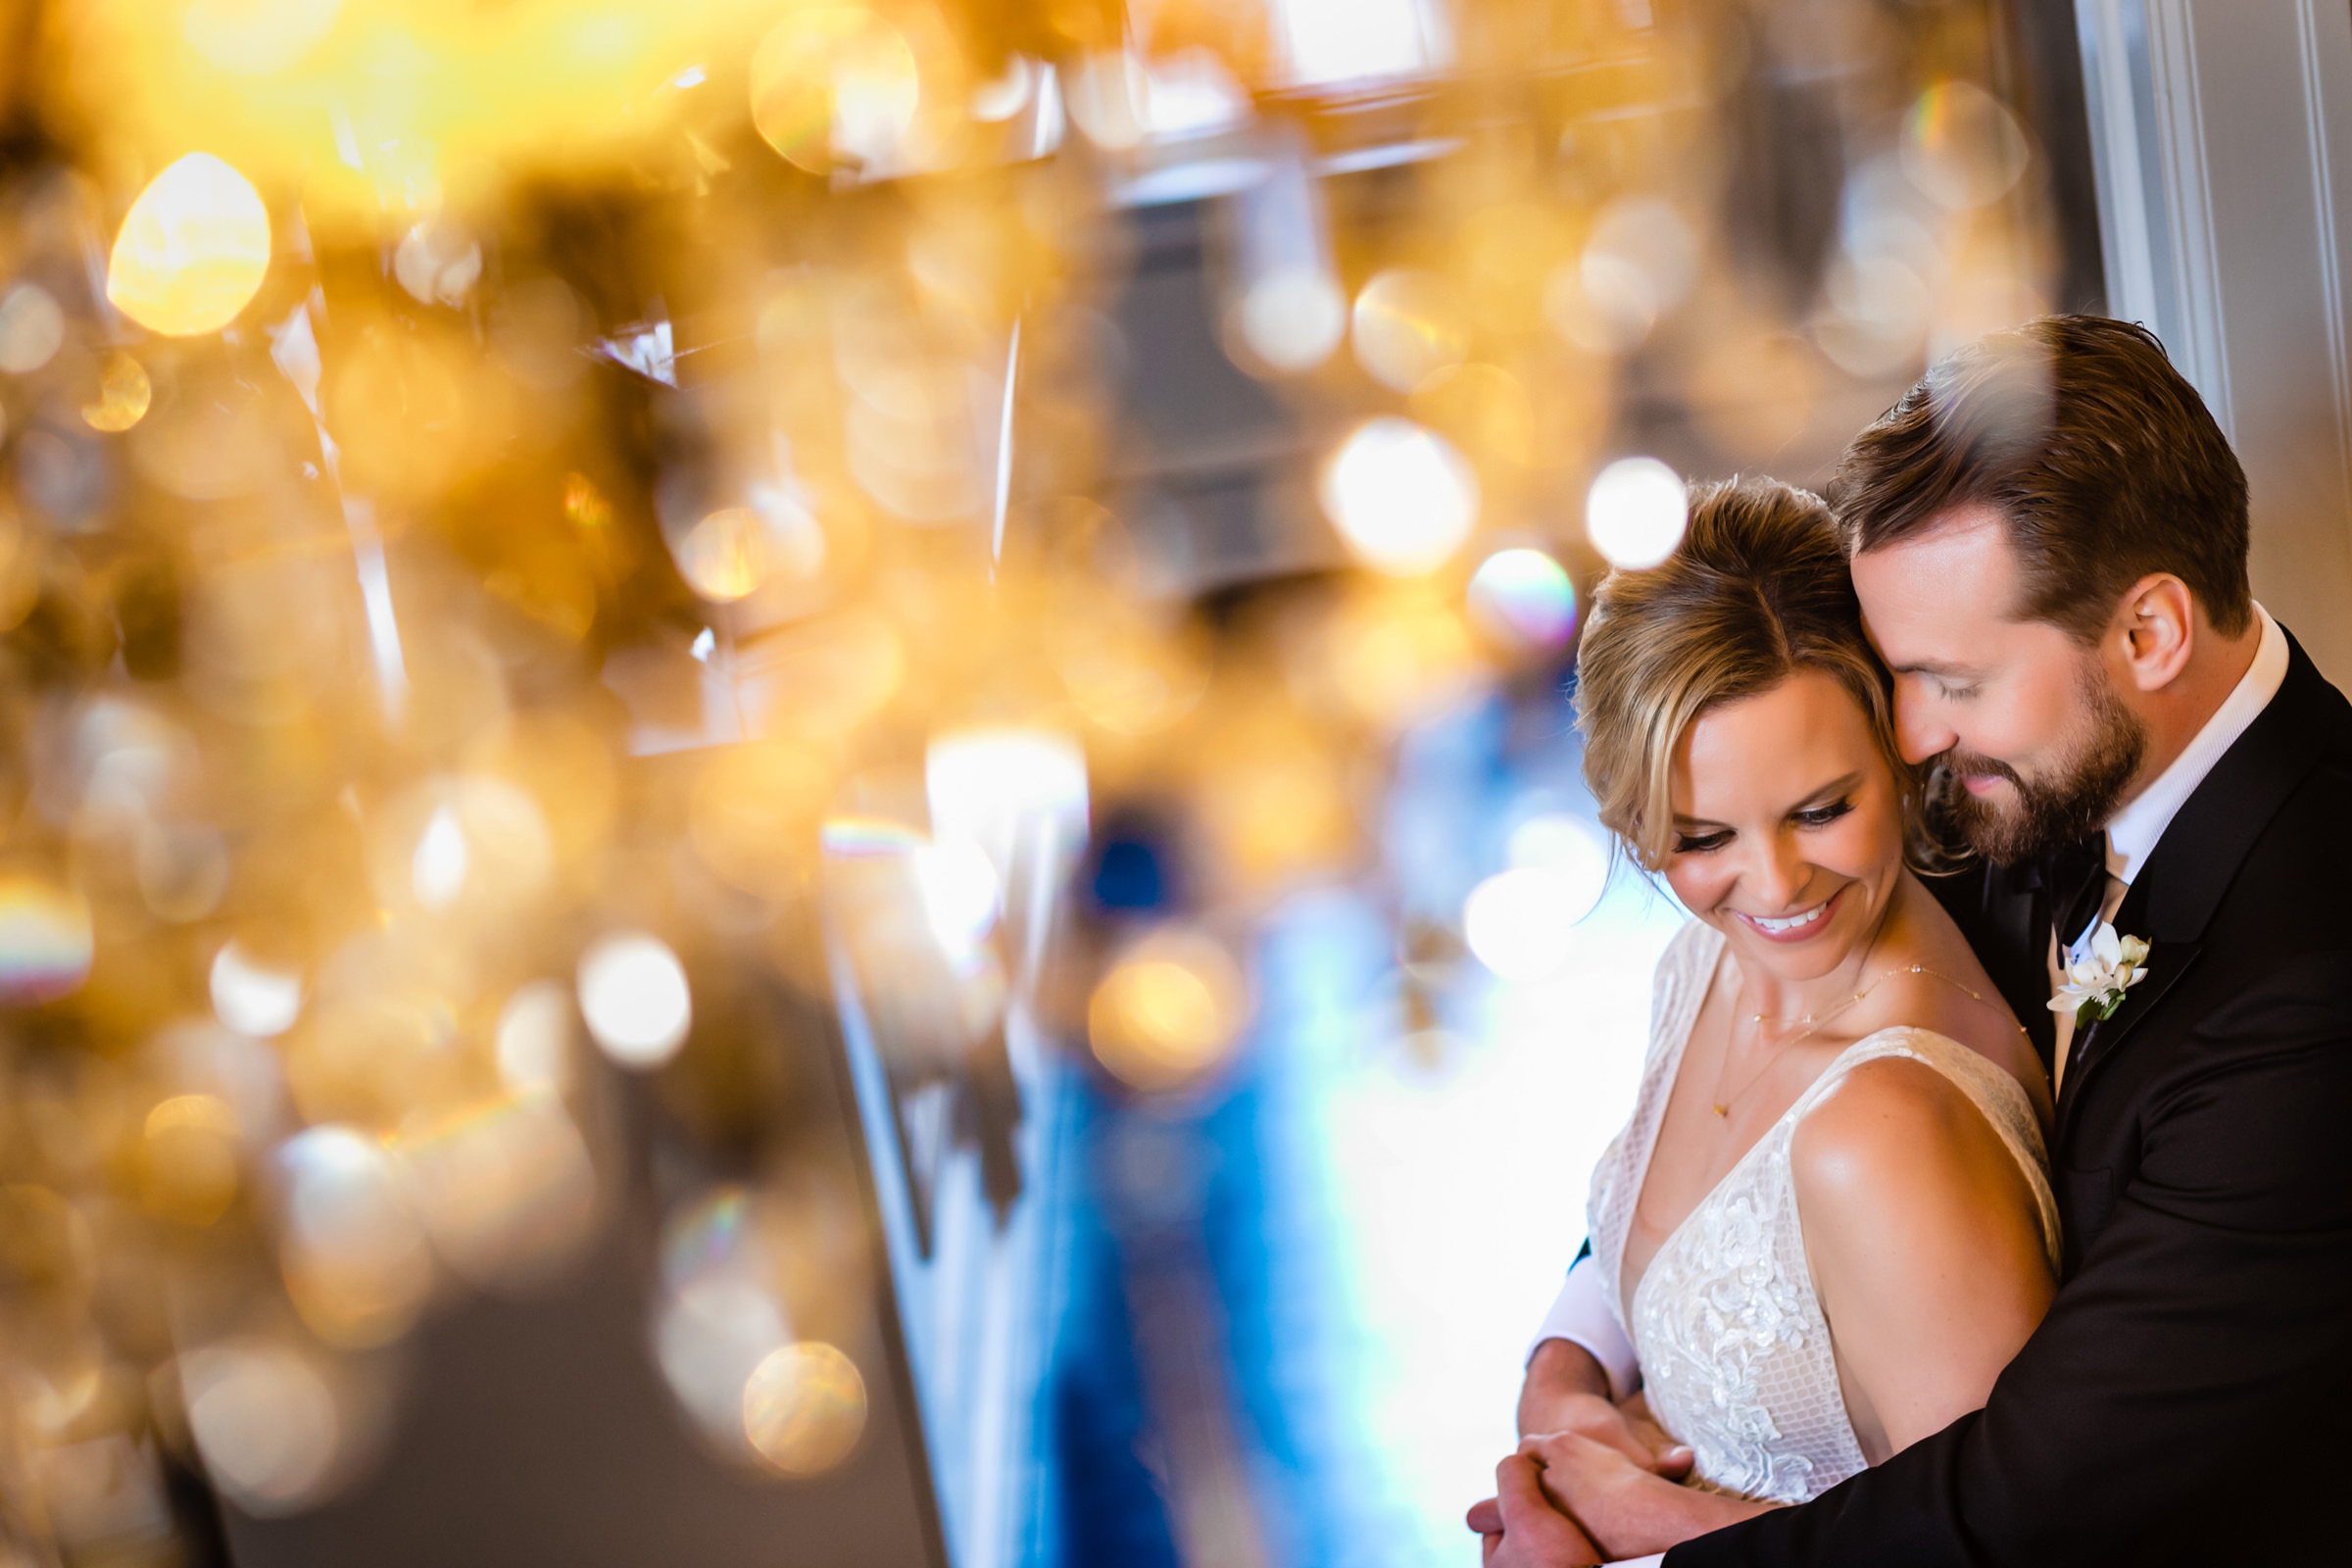 Bokeh lit couple embrace - photo by Jenny DeMarco Photography